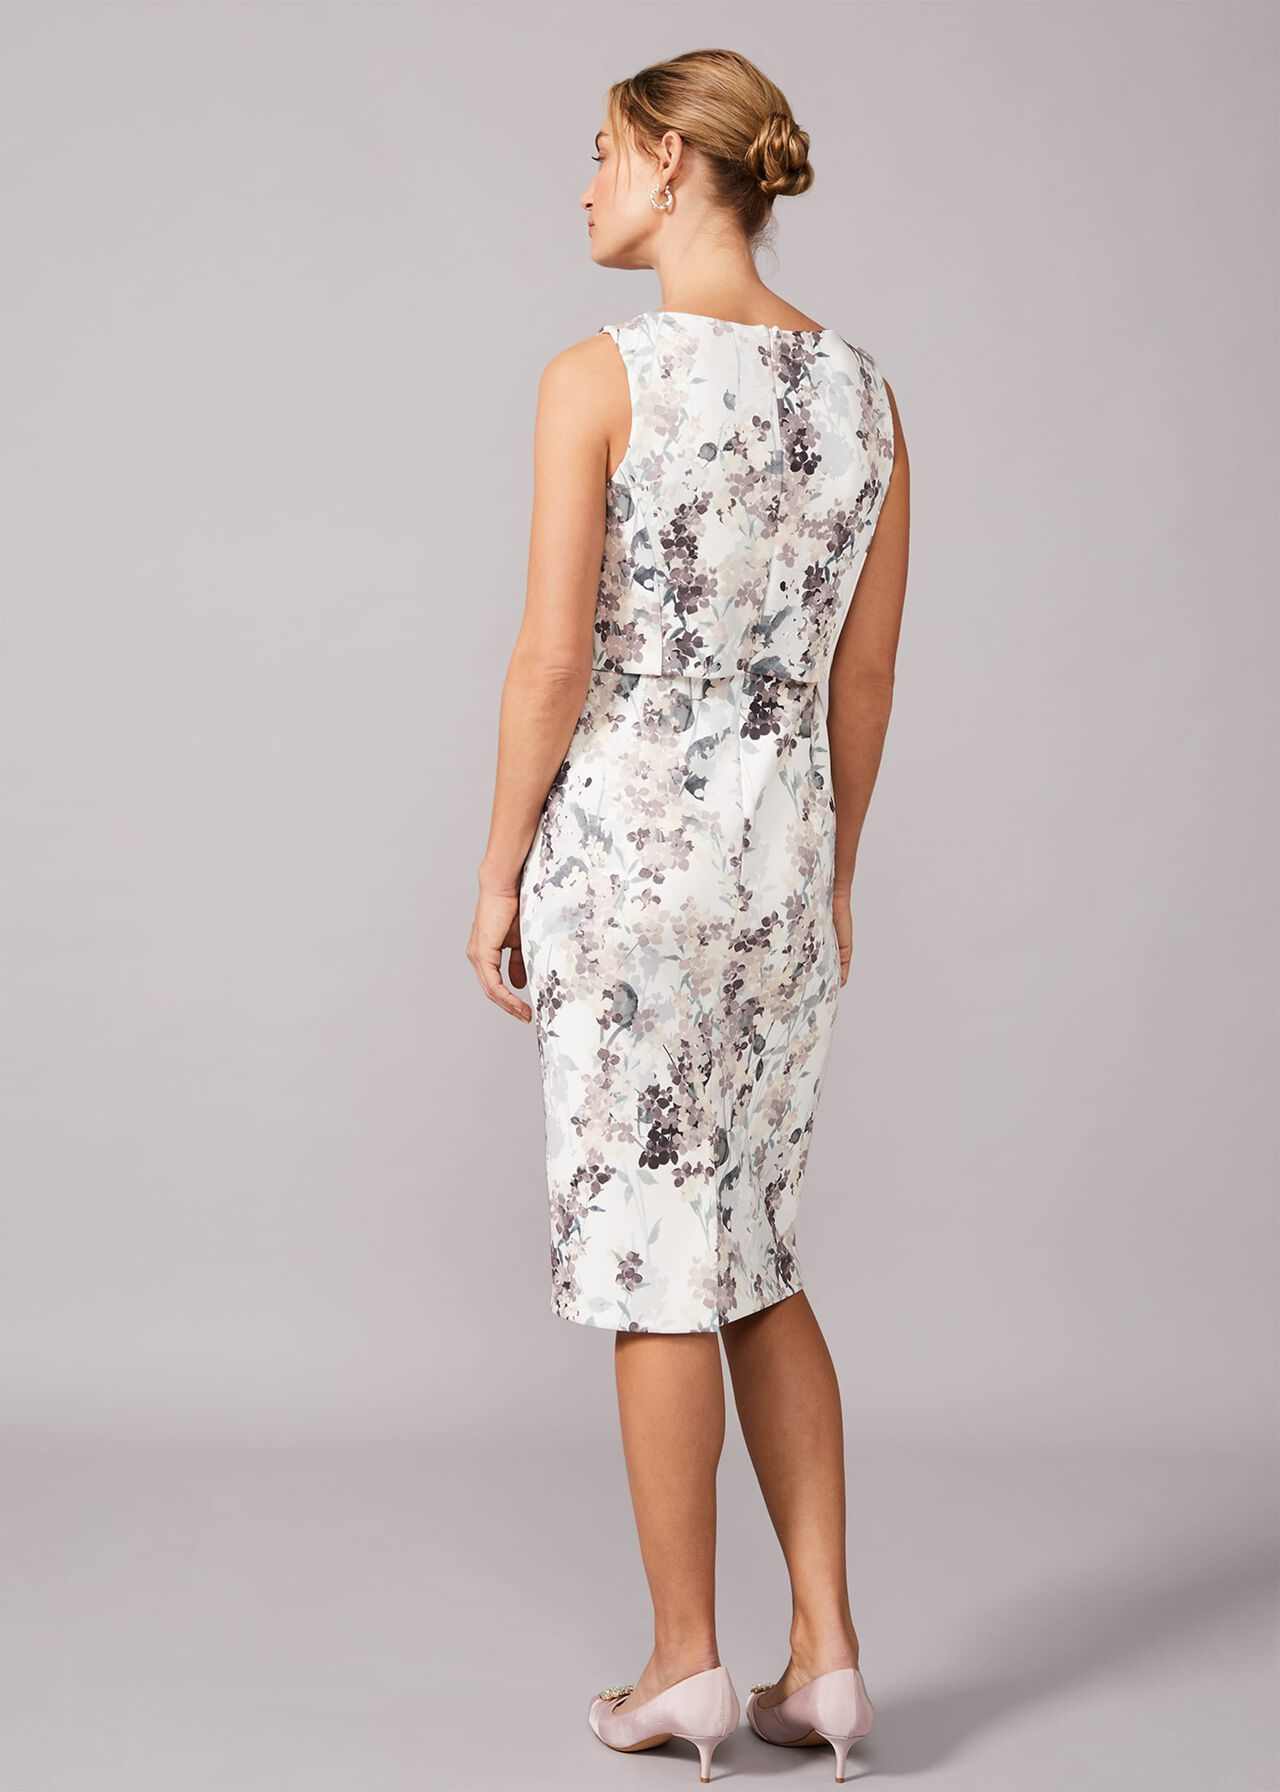 Violetta Double Layered Scuba Dress